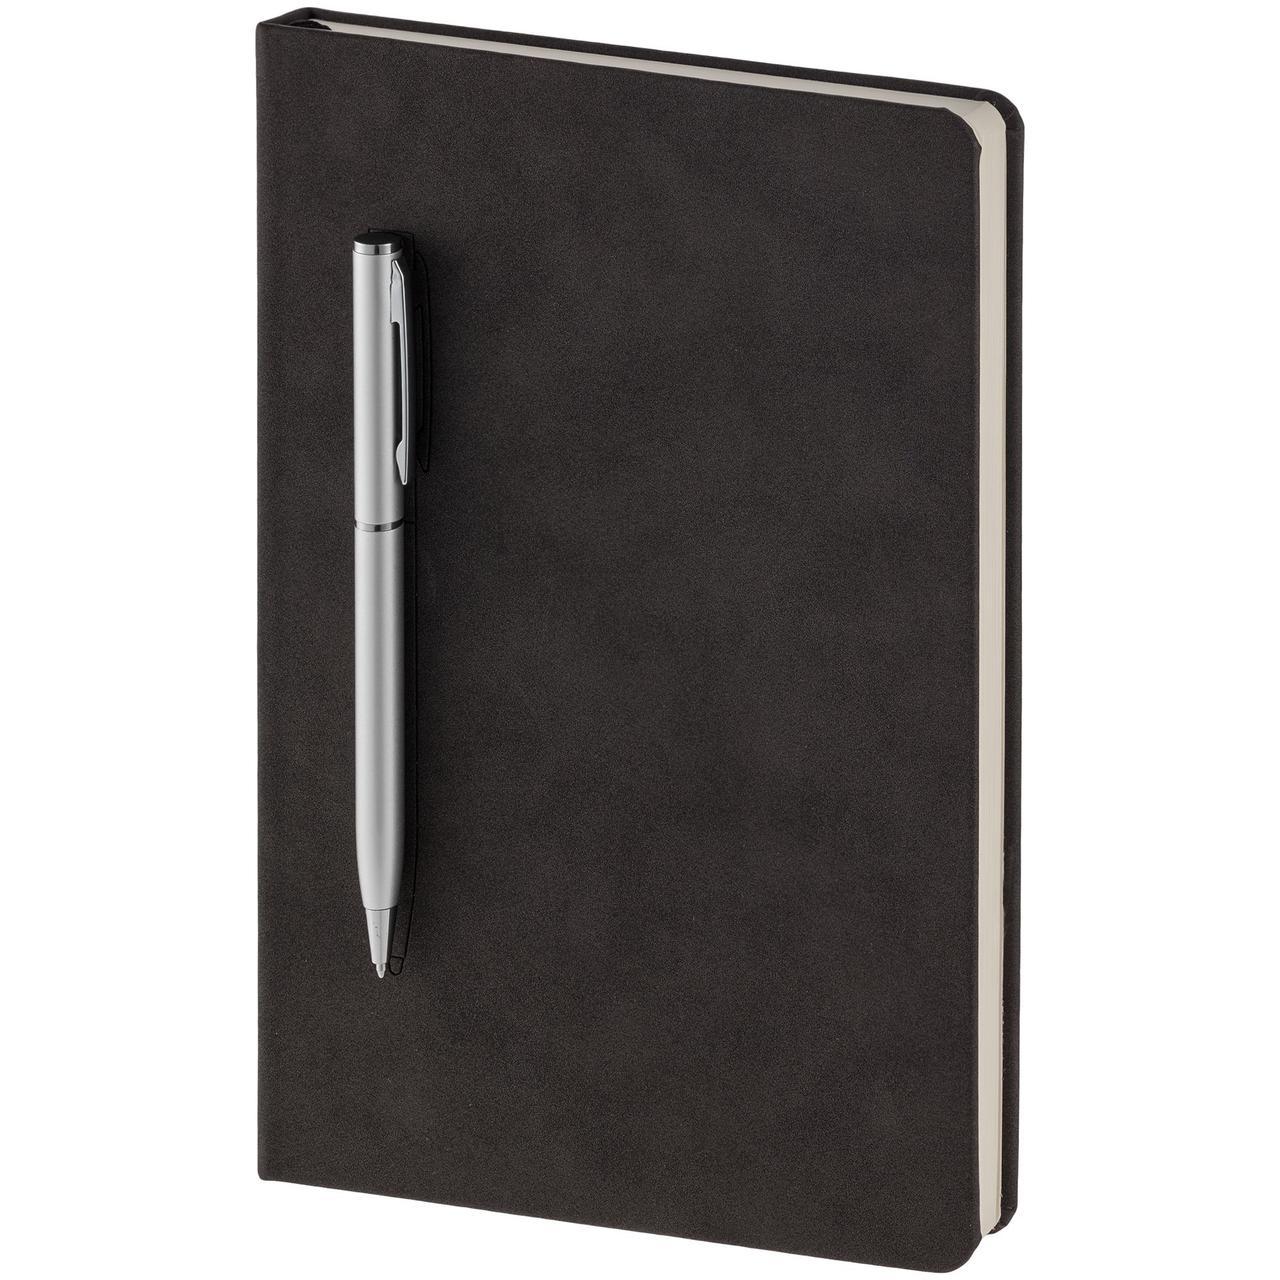 Блокнот Magnet Chrome с ручкой, черно-серый (артикул 15016.10)